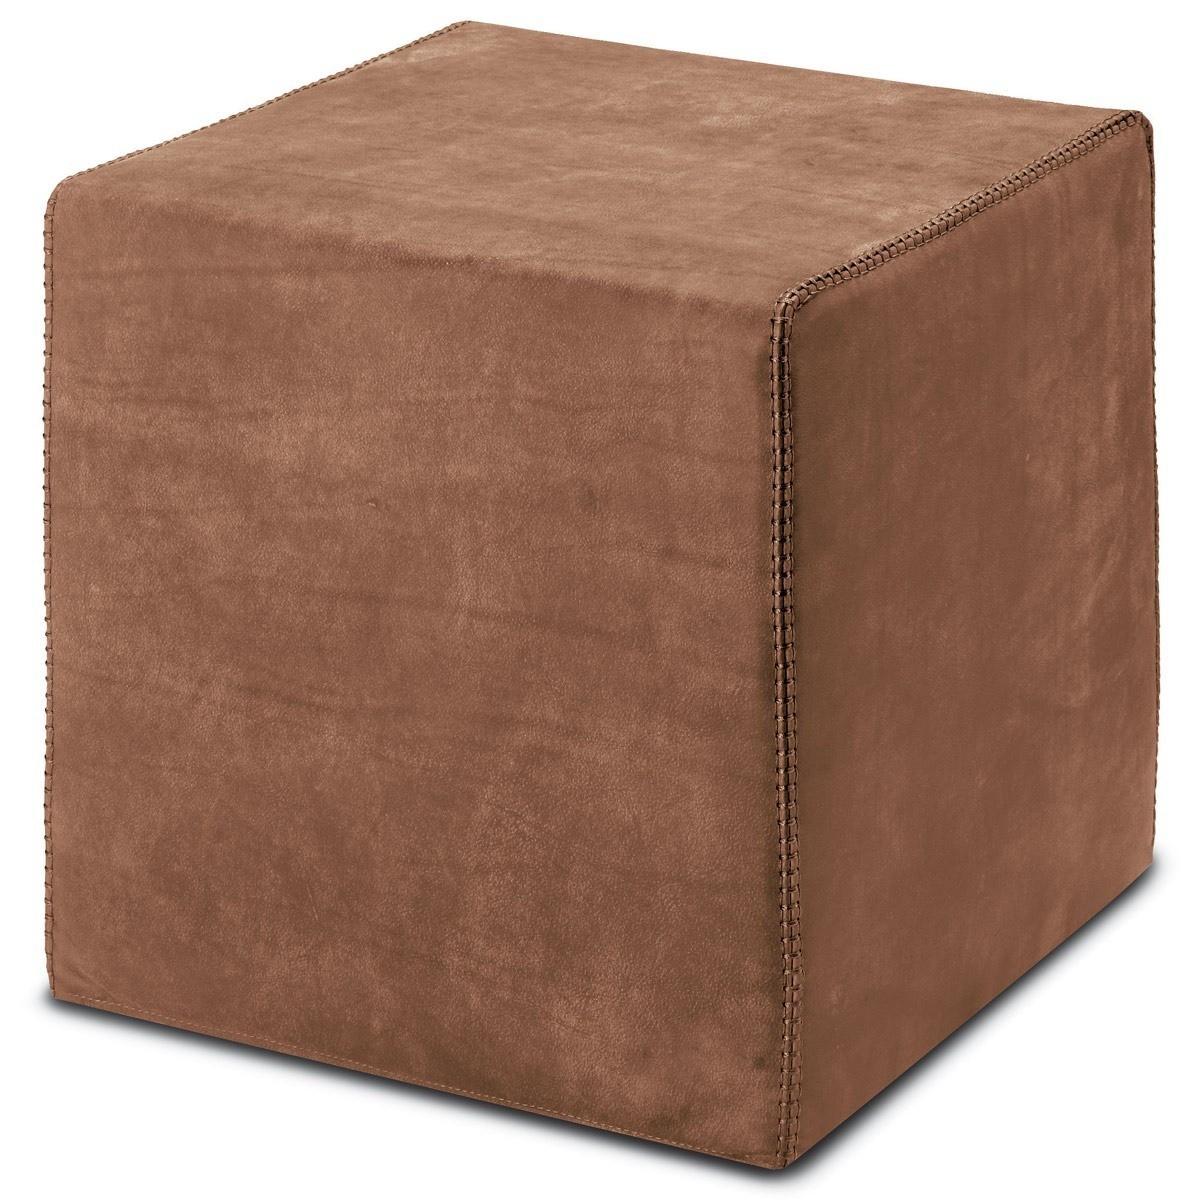 Missoni Home Gravita Oman Leather: Pouf Cube Oman